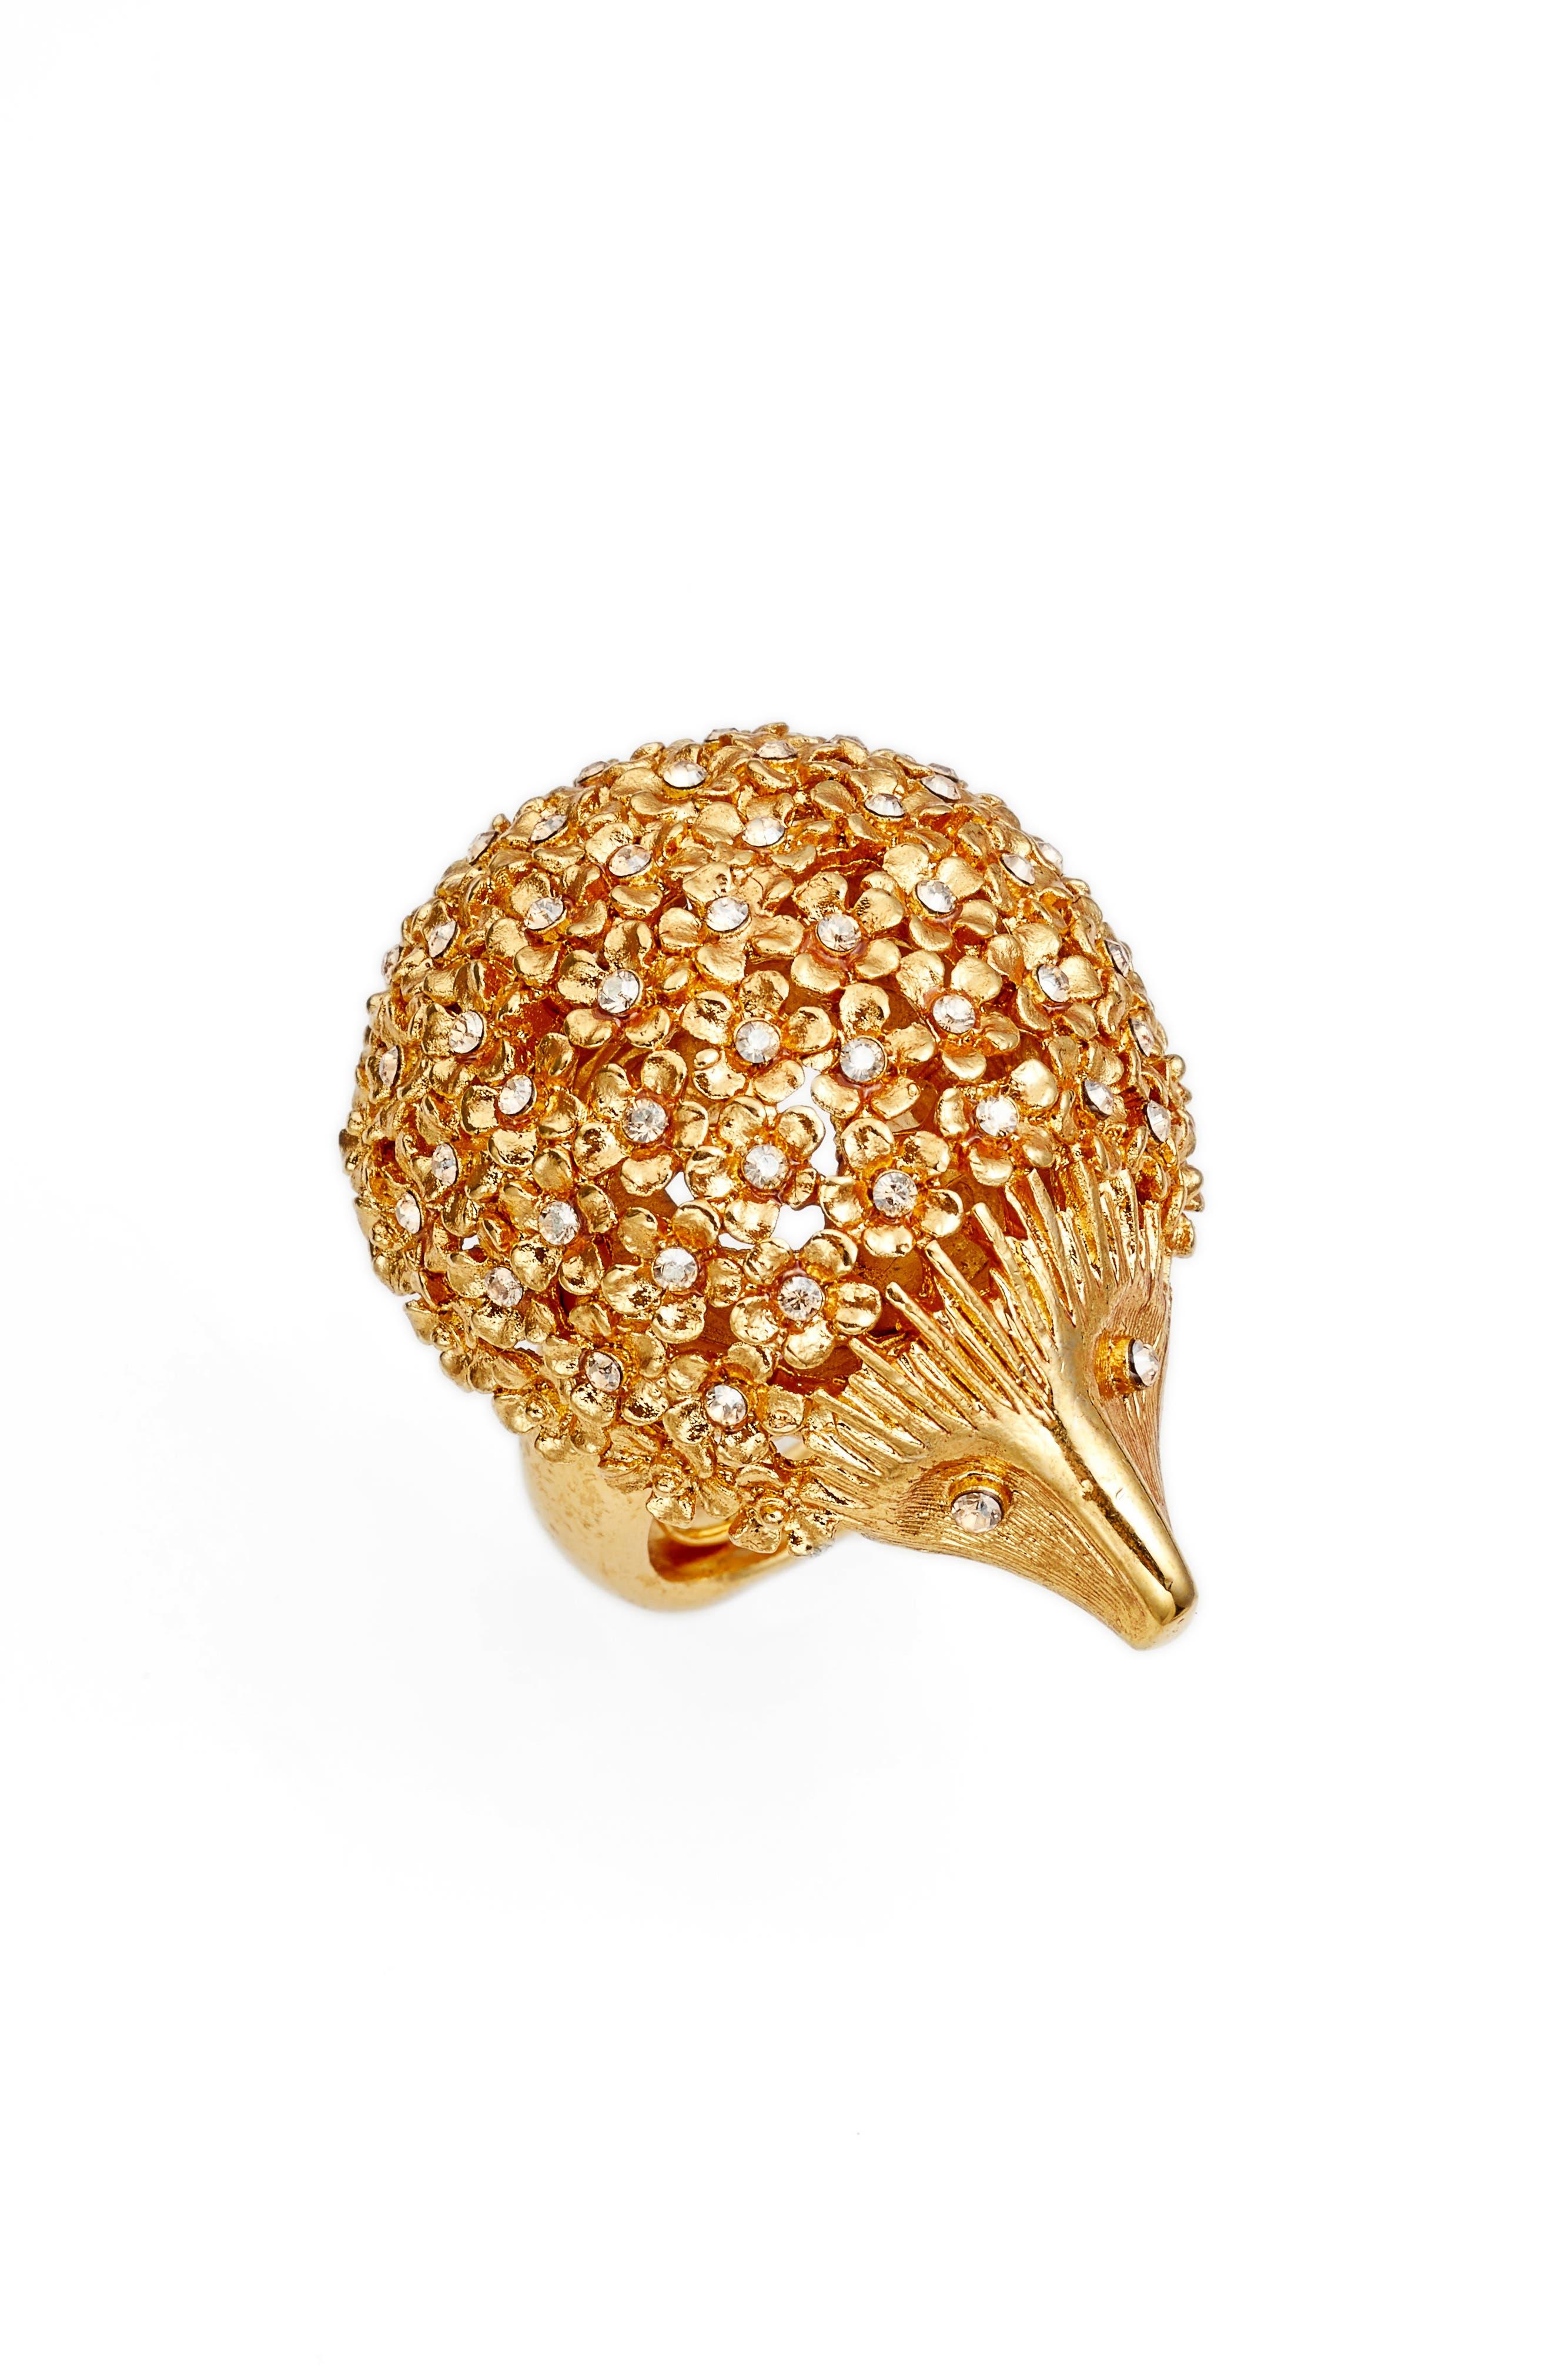 Crystal Hedgehog Ring,                         Main,                         color, Crystal Gold Shadow